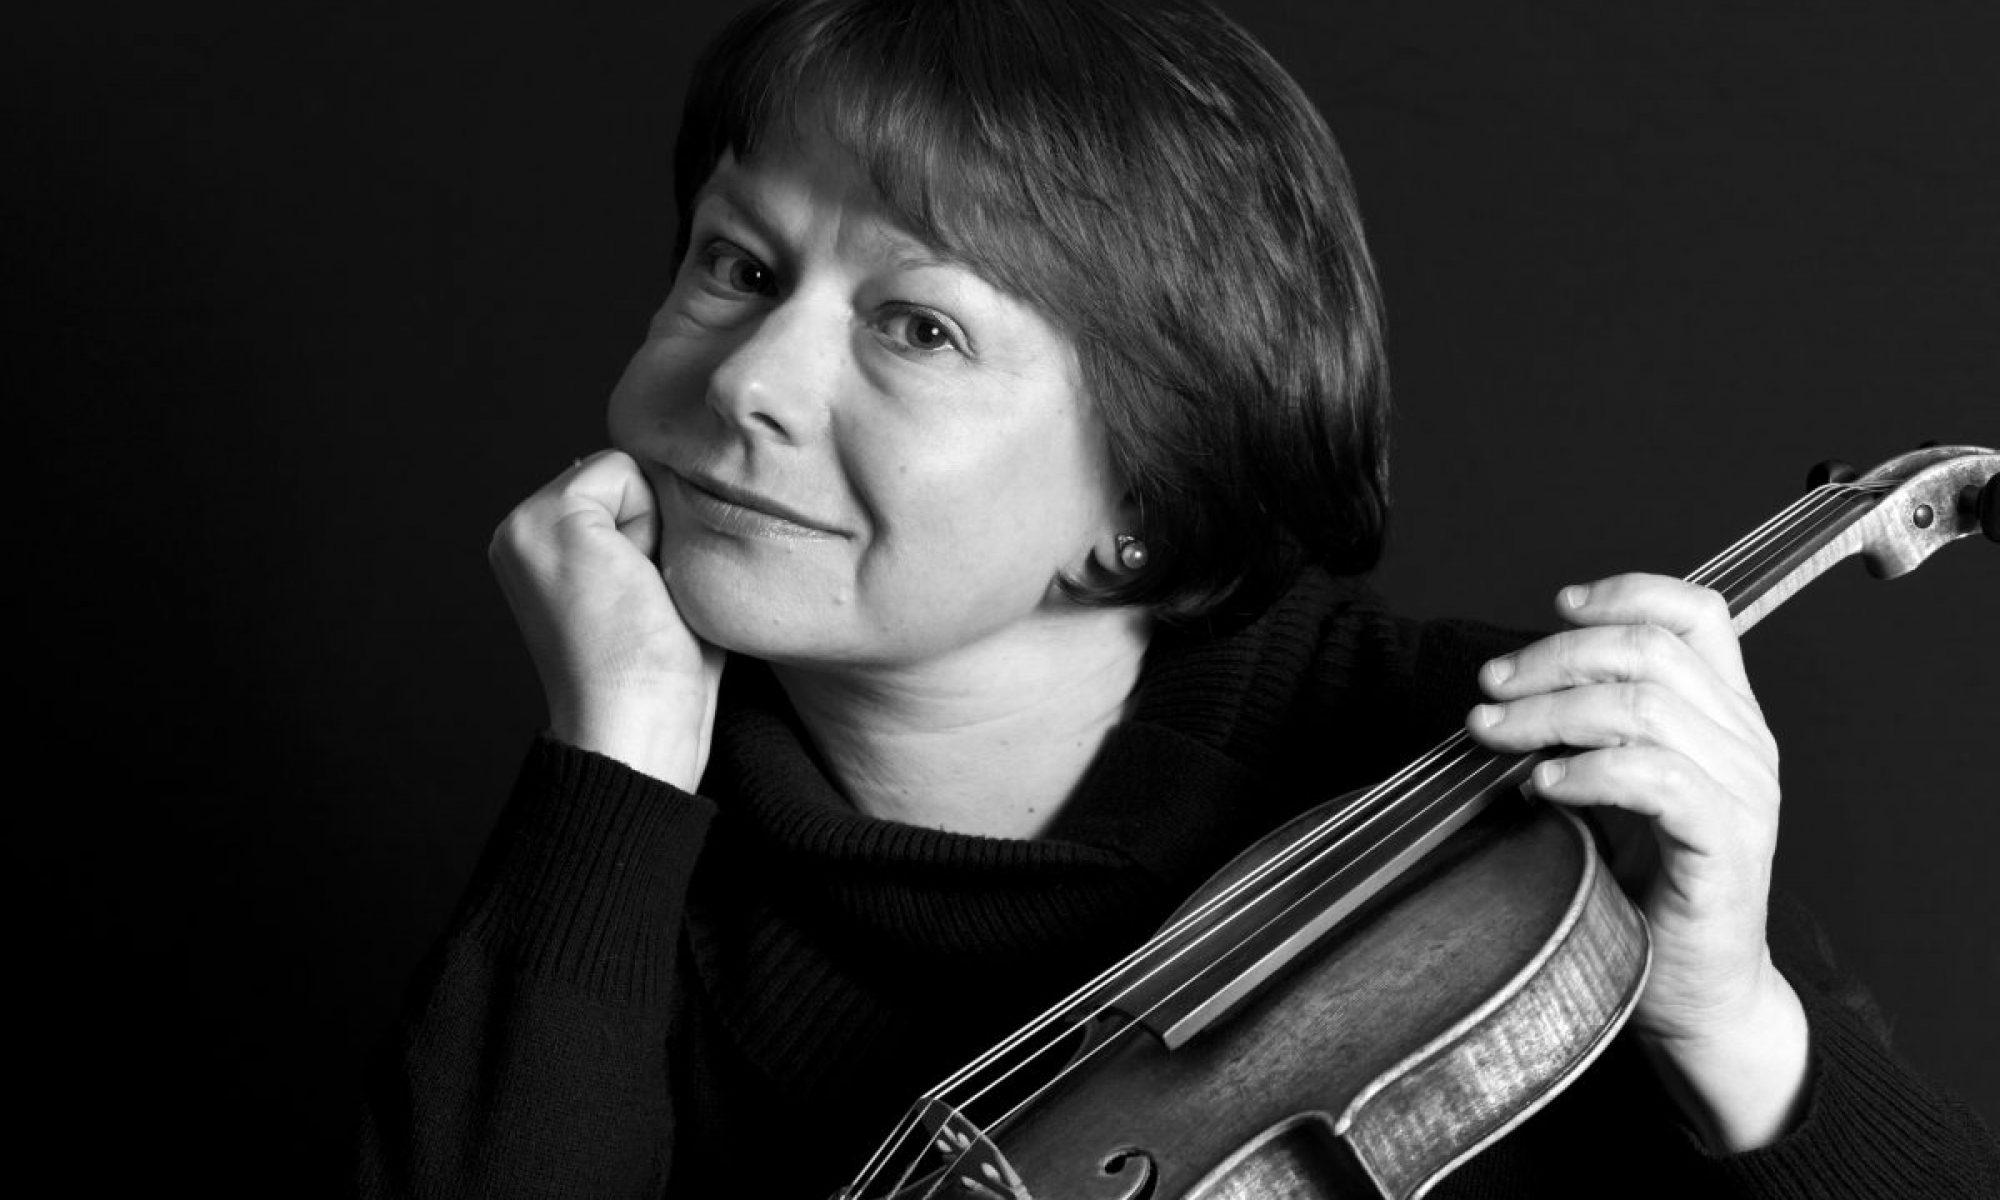 Anne-Kathrin Lindig